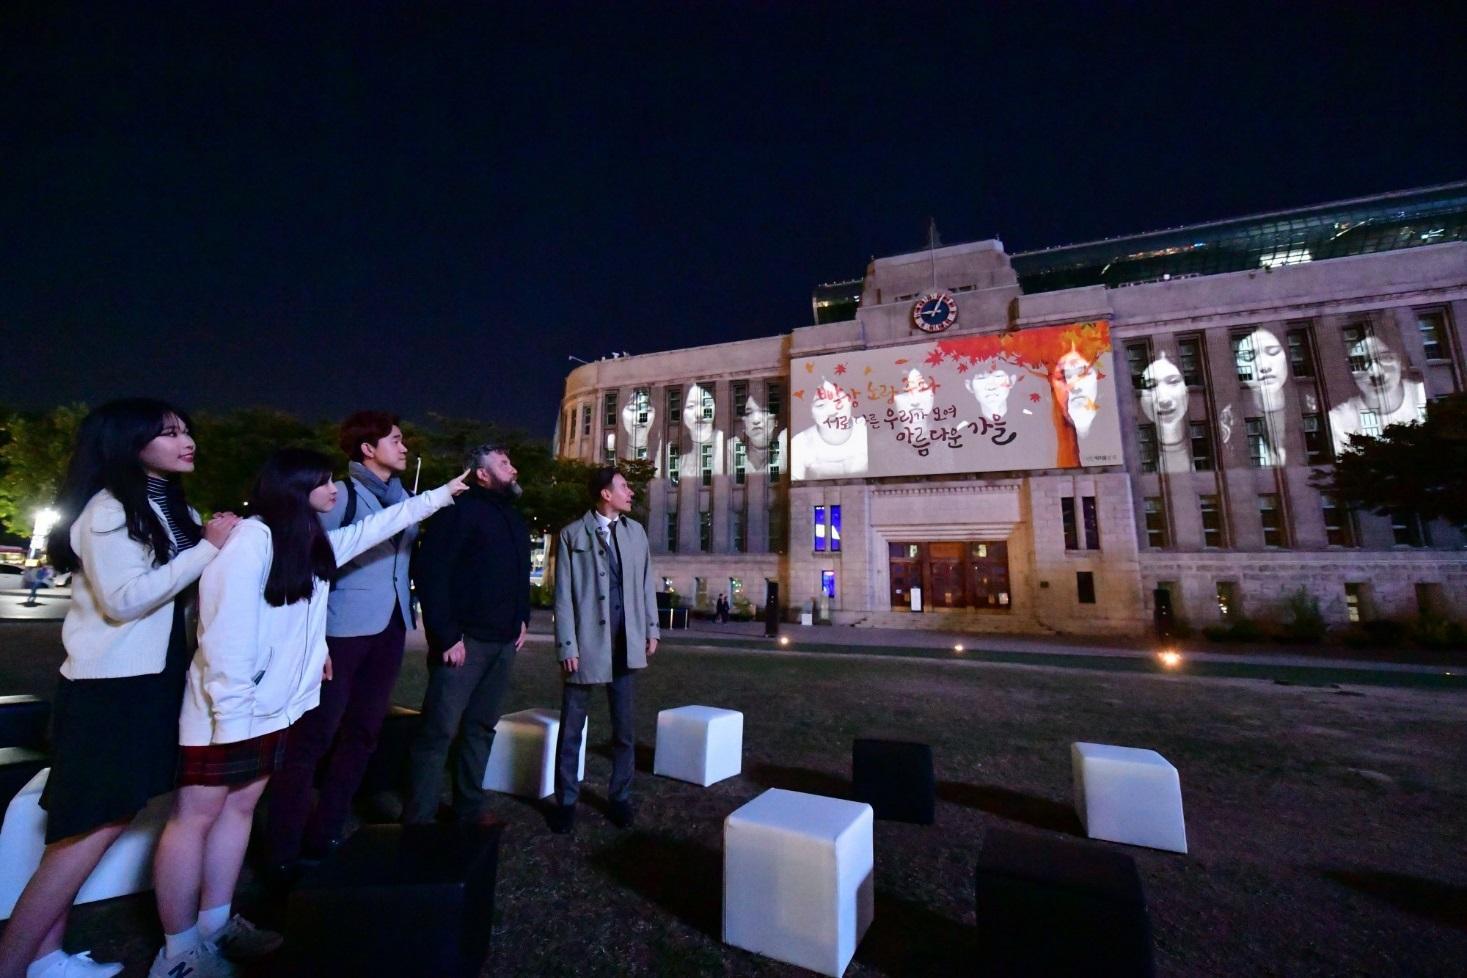 R:\ClientServing\Han Sung Motor\16. Photo\2018.10.02 SFAC 서울거리예술축제 행사\선별\보도자료 최종\181002[사진2].jpg